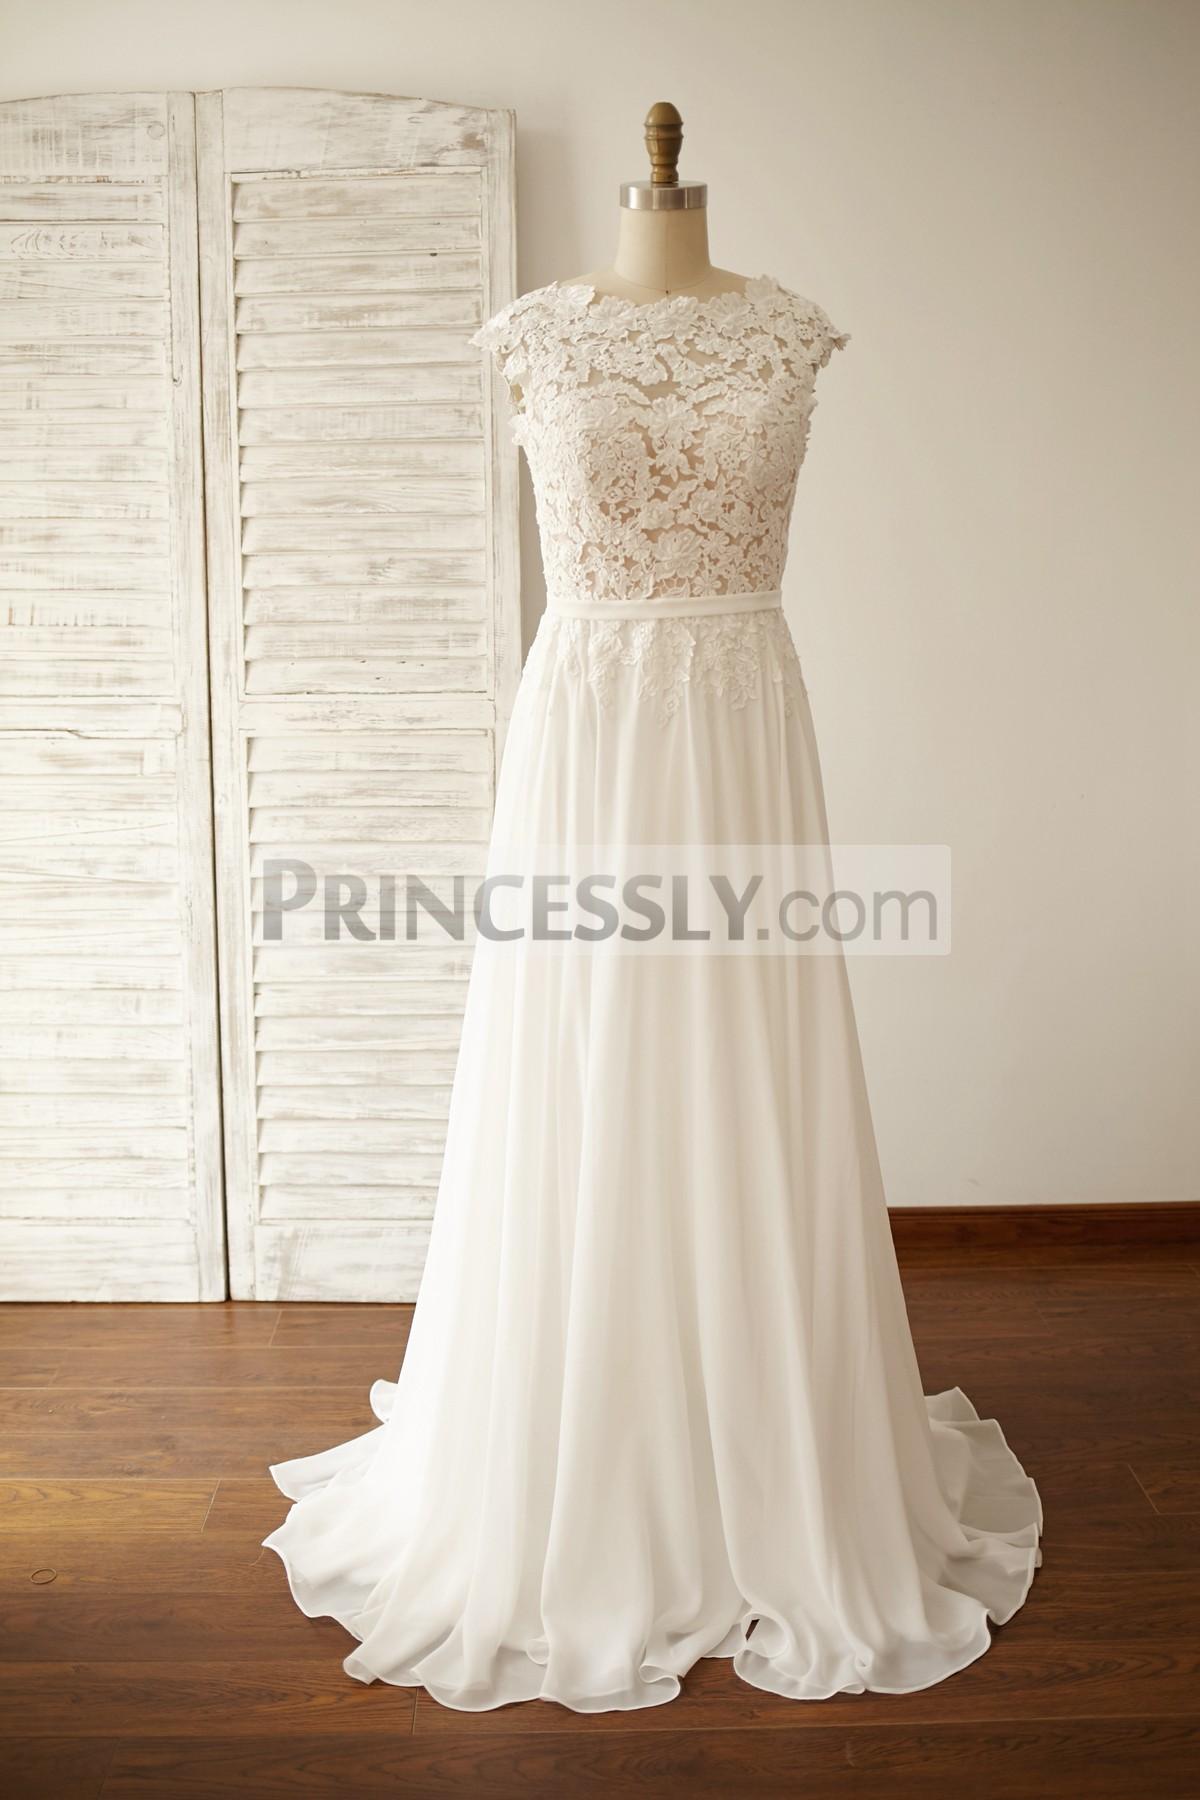 Princessly.com-K1000053-Vintage Deep V Back Lace Chiffon Wedding Dress-31